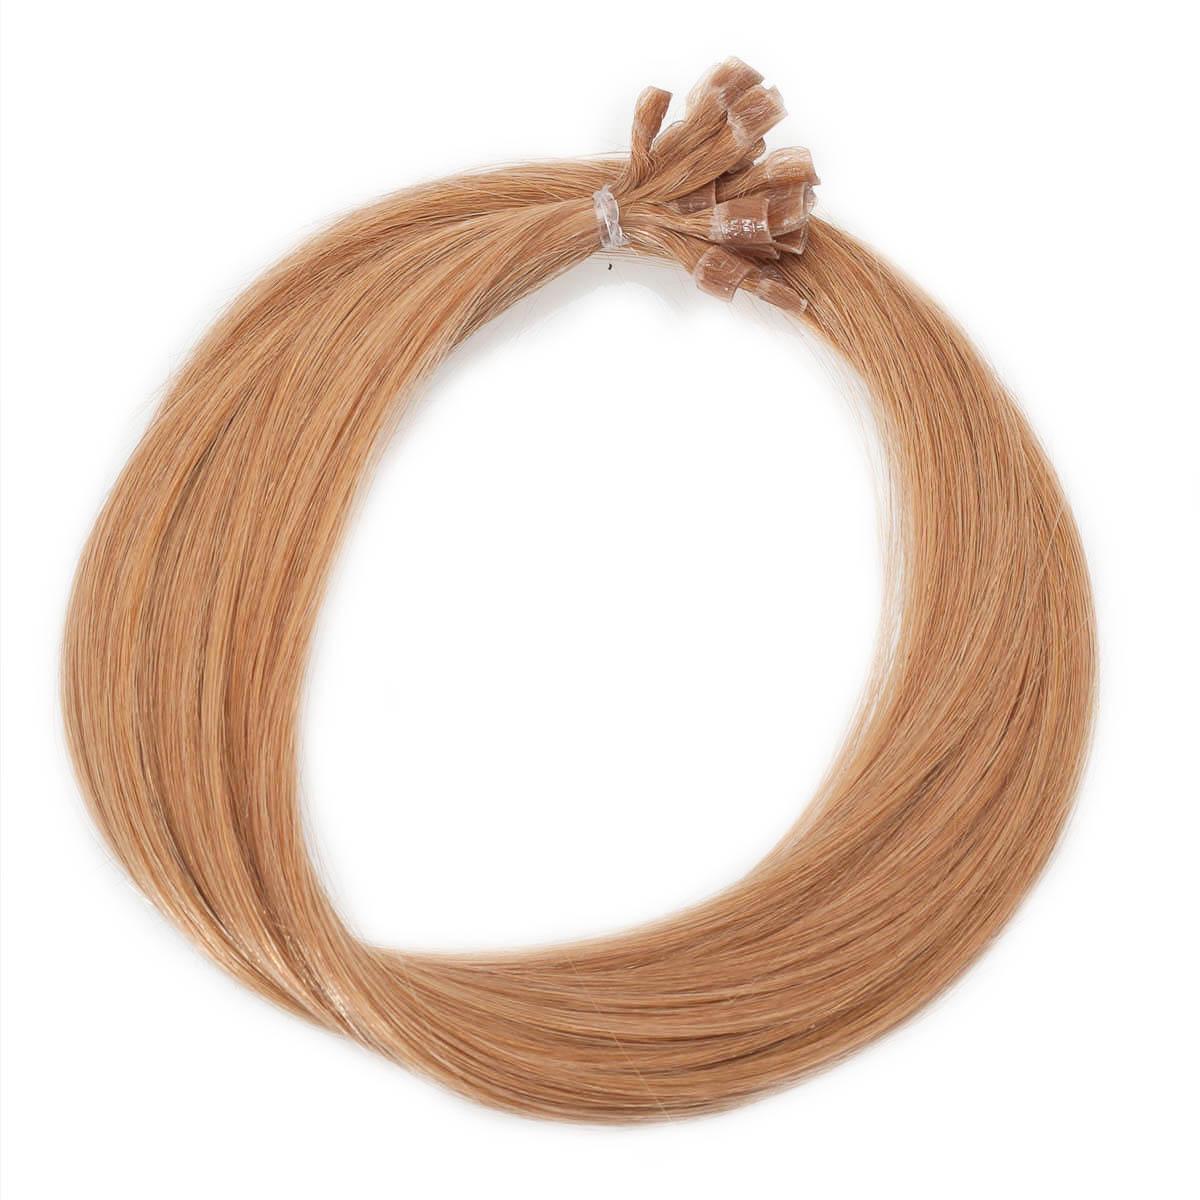 Nail Hair Original 7.4 Medium Golden Blonde 40 cm